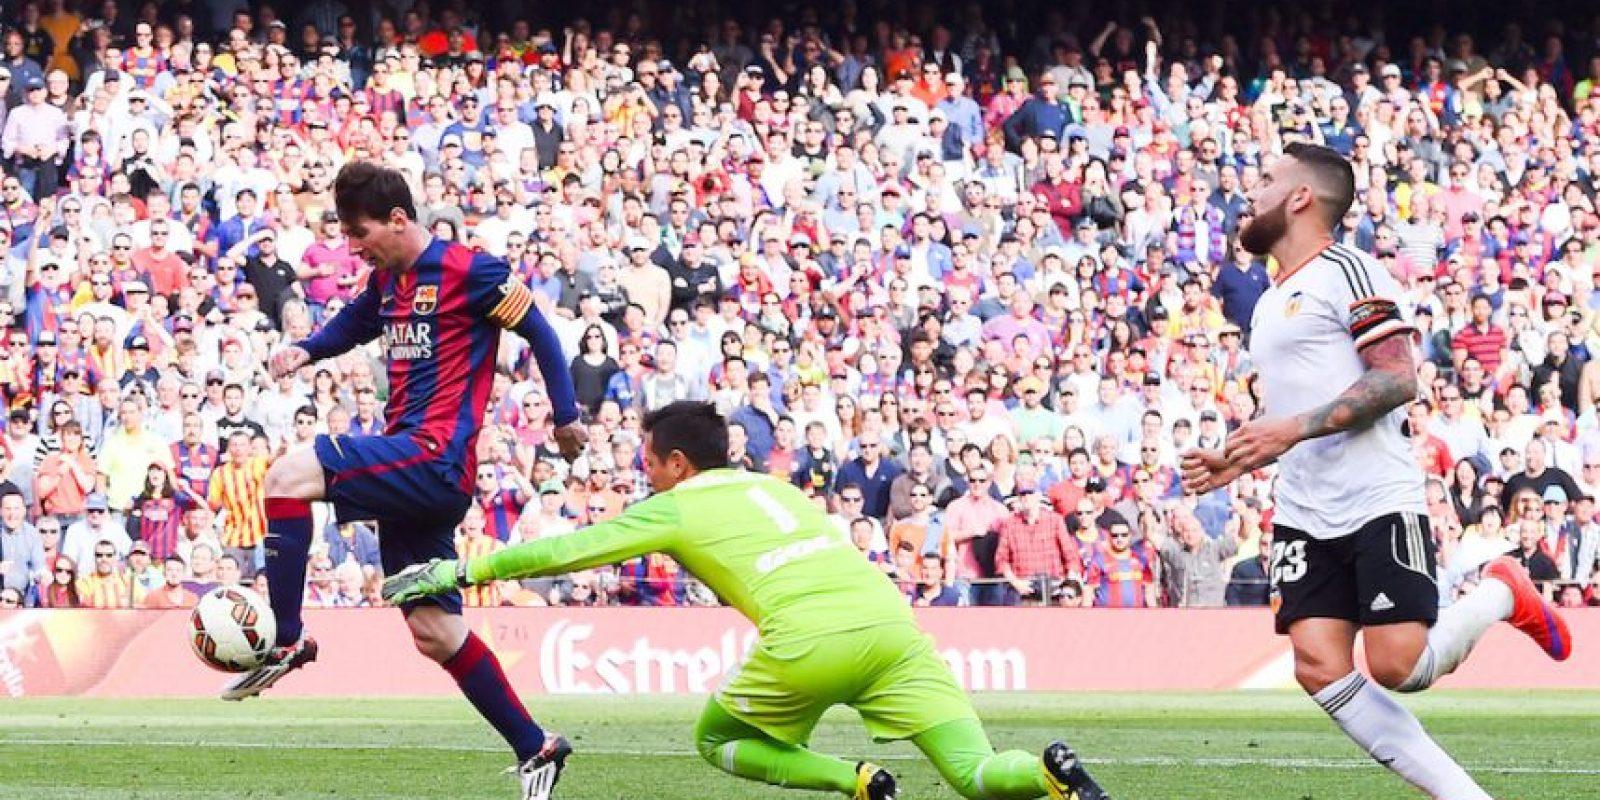 Messi hizo el segundo gol del partido contra Valencia. Foto:Getty Images